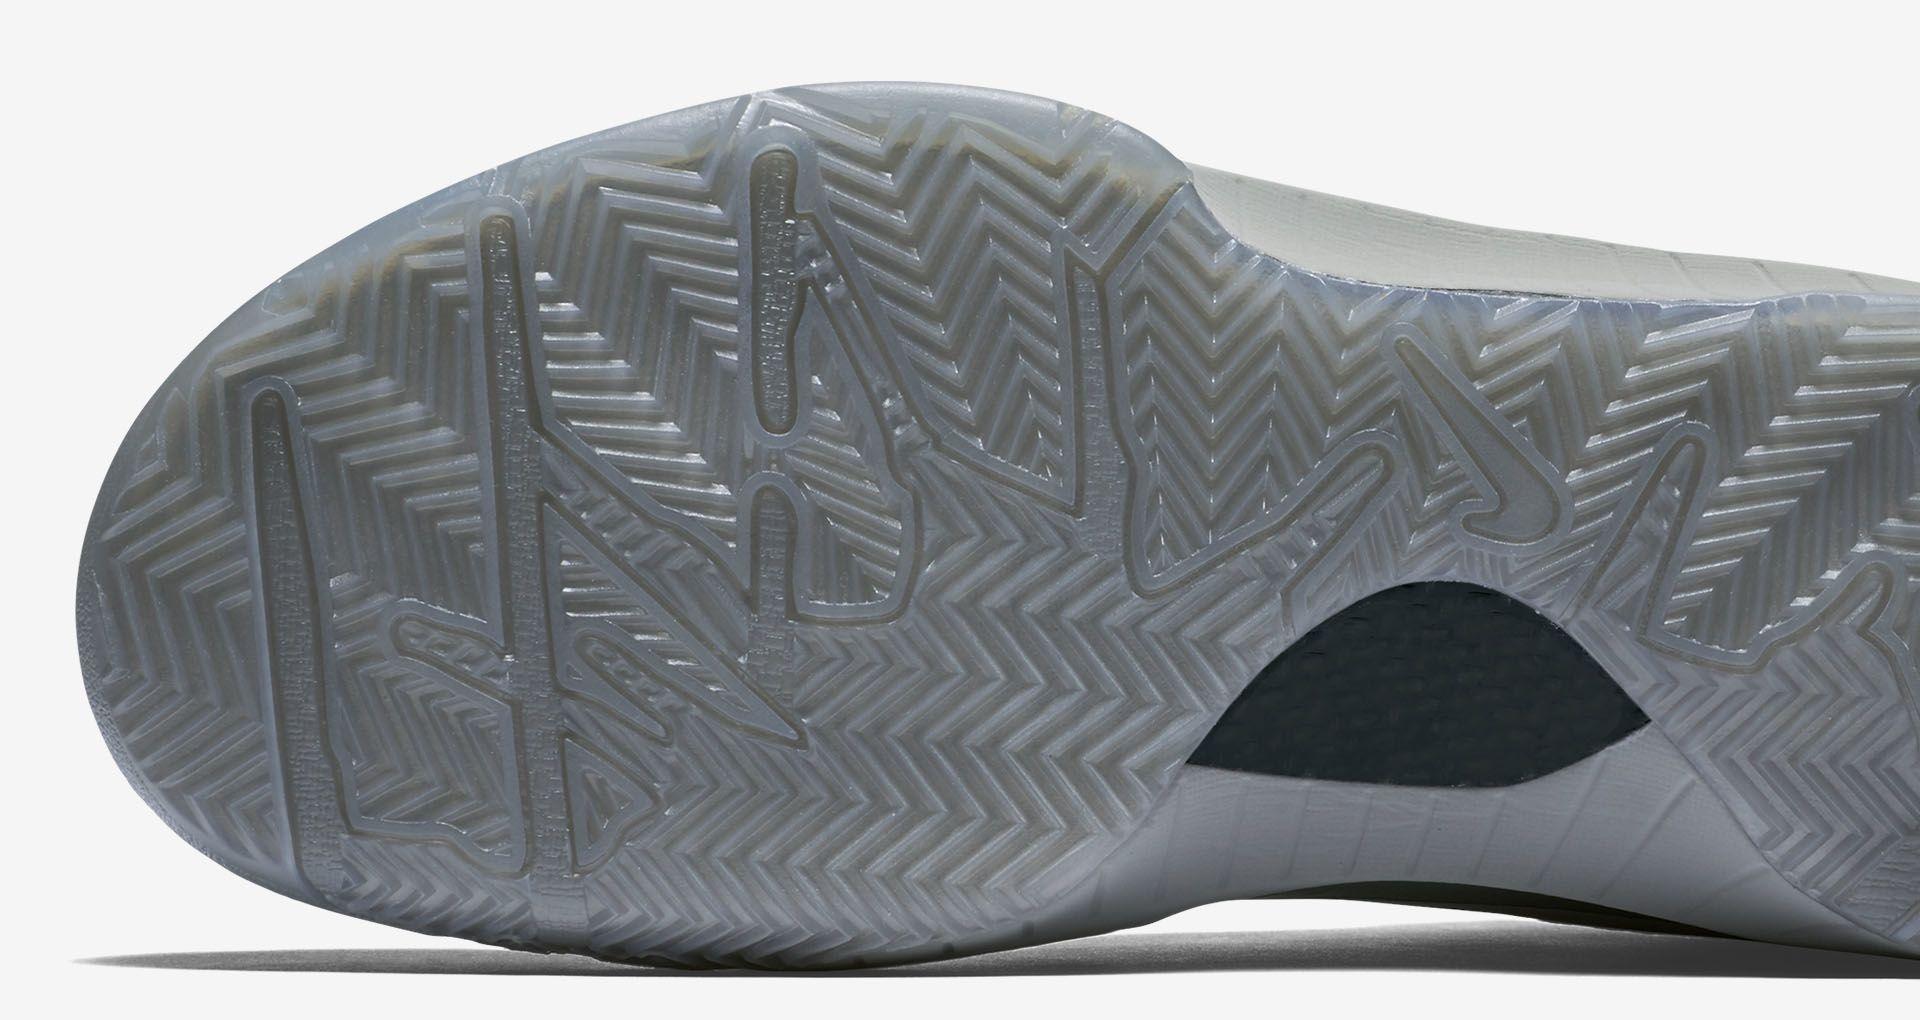 9239ad5a22e2 Nike Kobe 4  Black Mamba  Release Date. Nike+ SNKRS